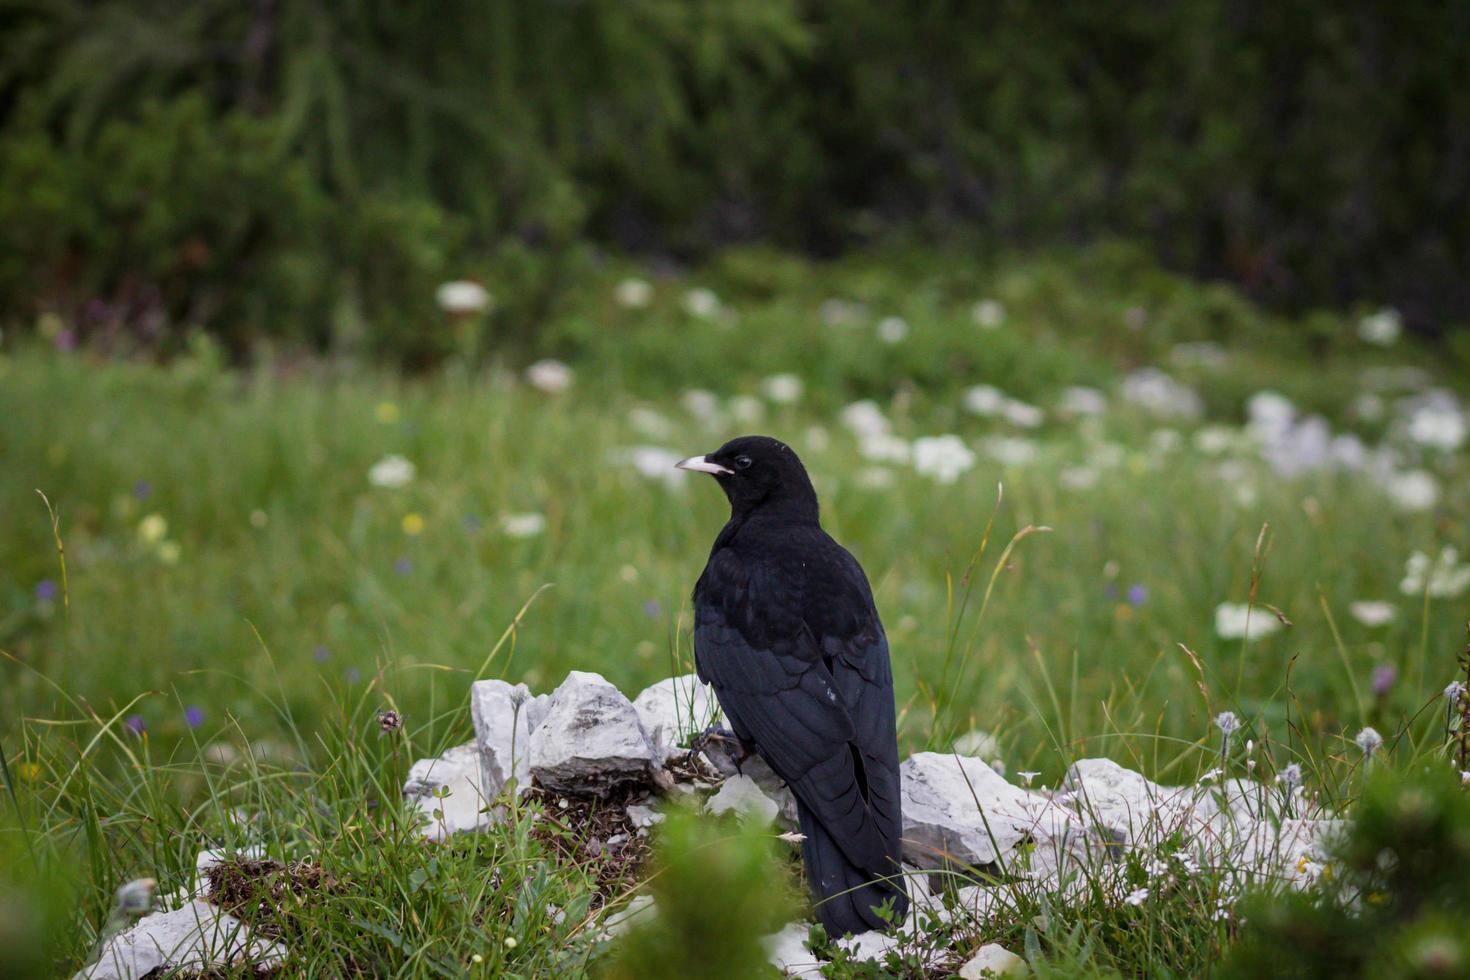 Krähe auf Felsen im Gras foto